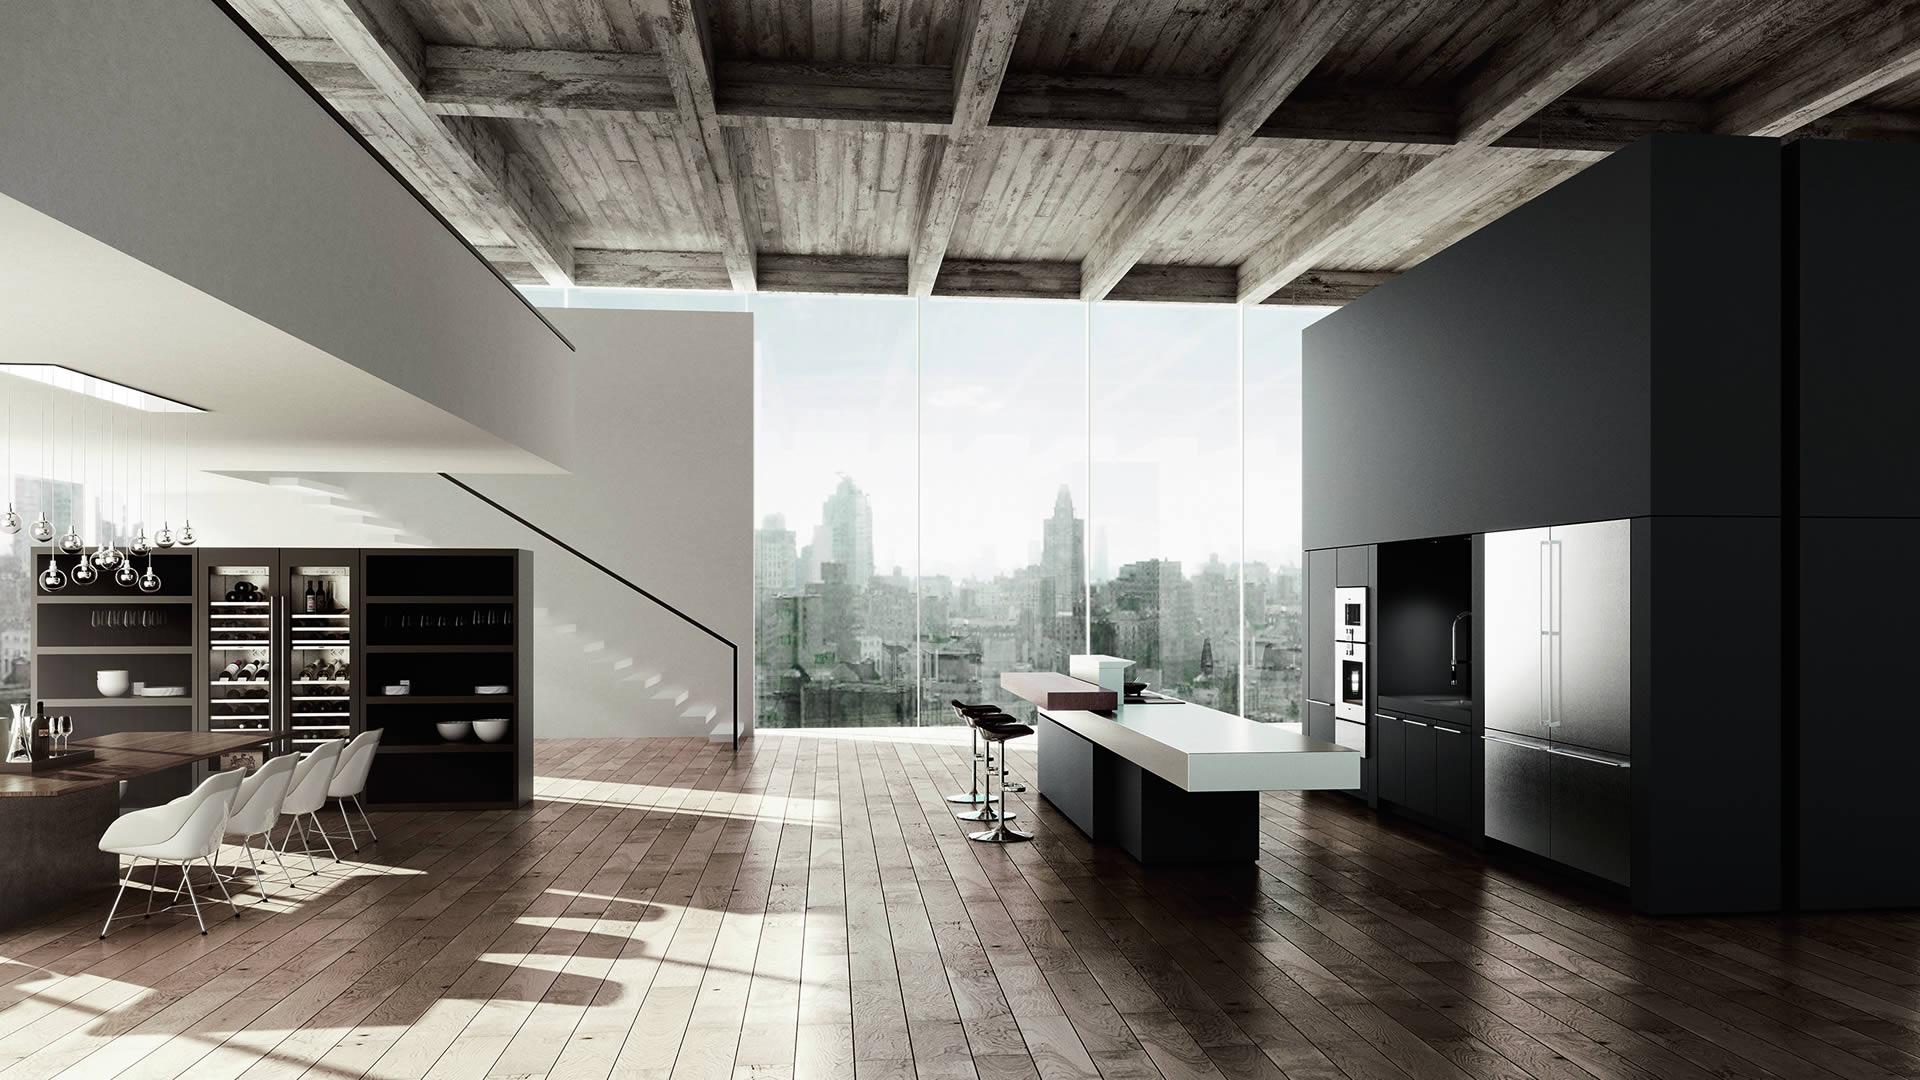 GAGGENAU  Fine Luxury Kitchen Appliances  Nordic